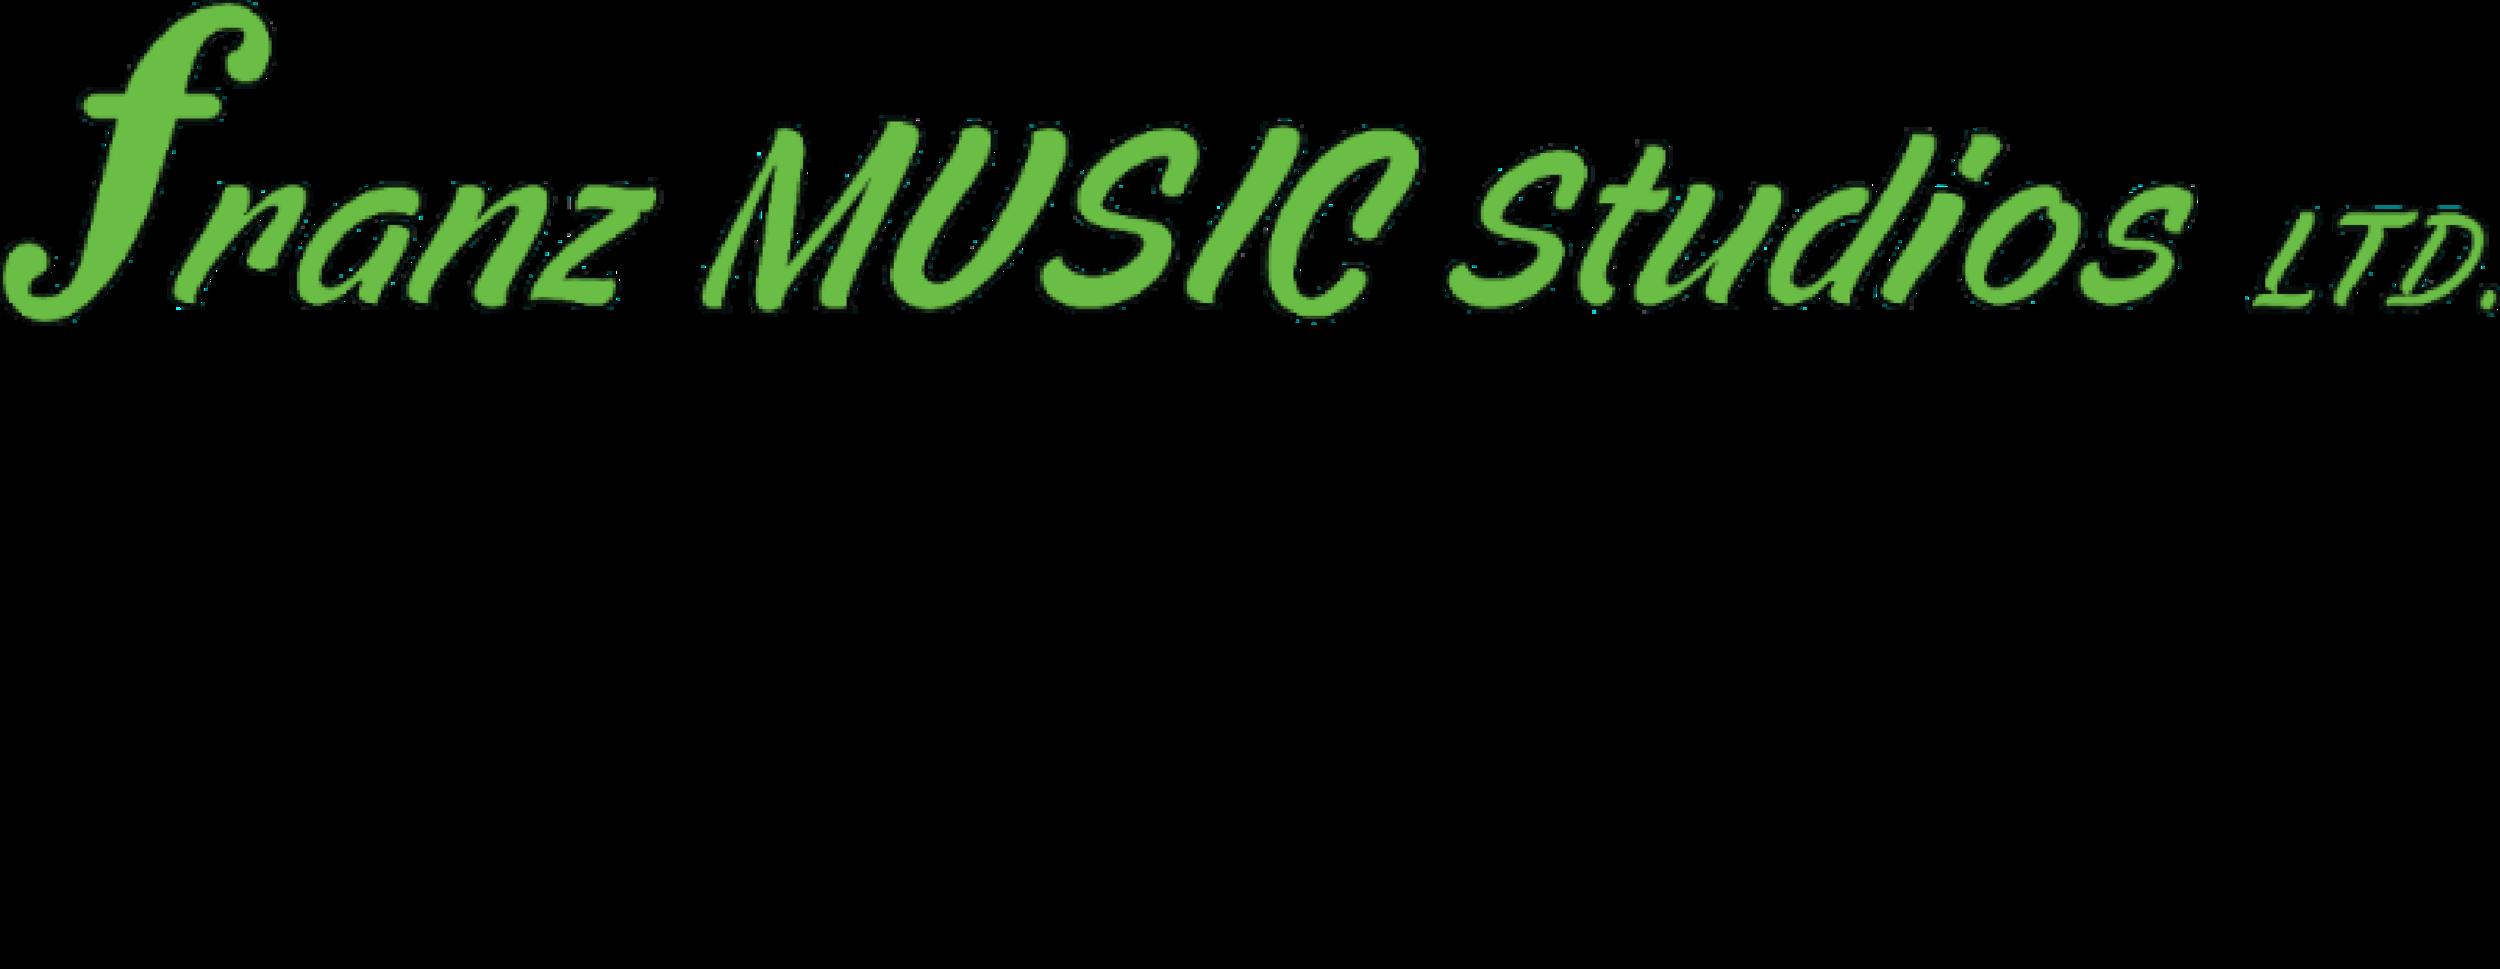 Franz New logo.png